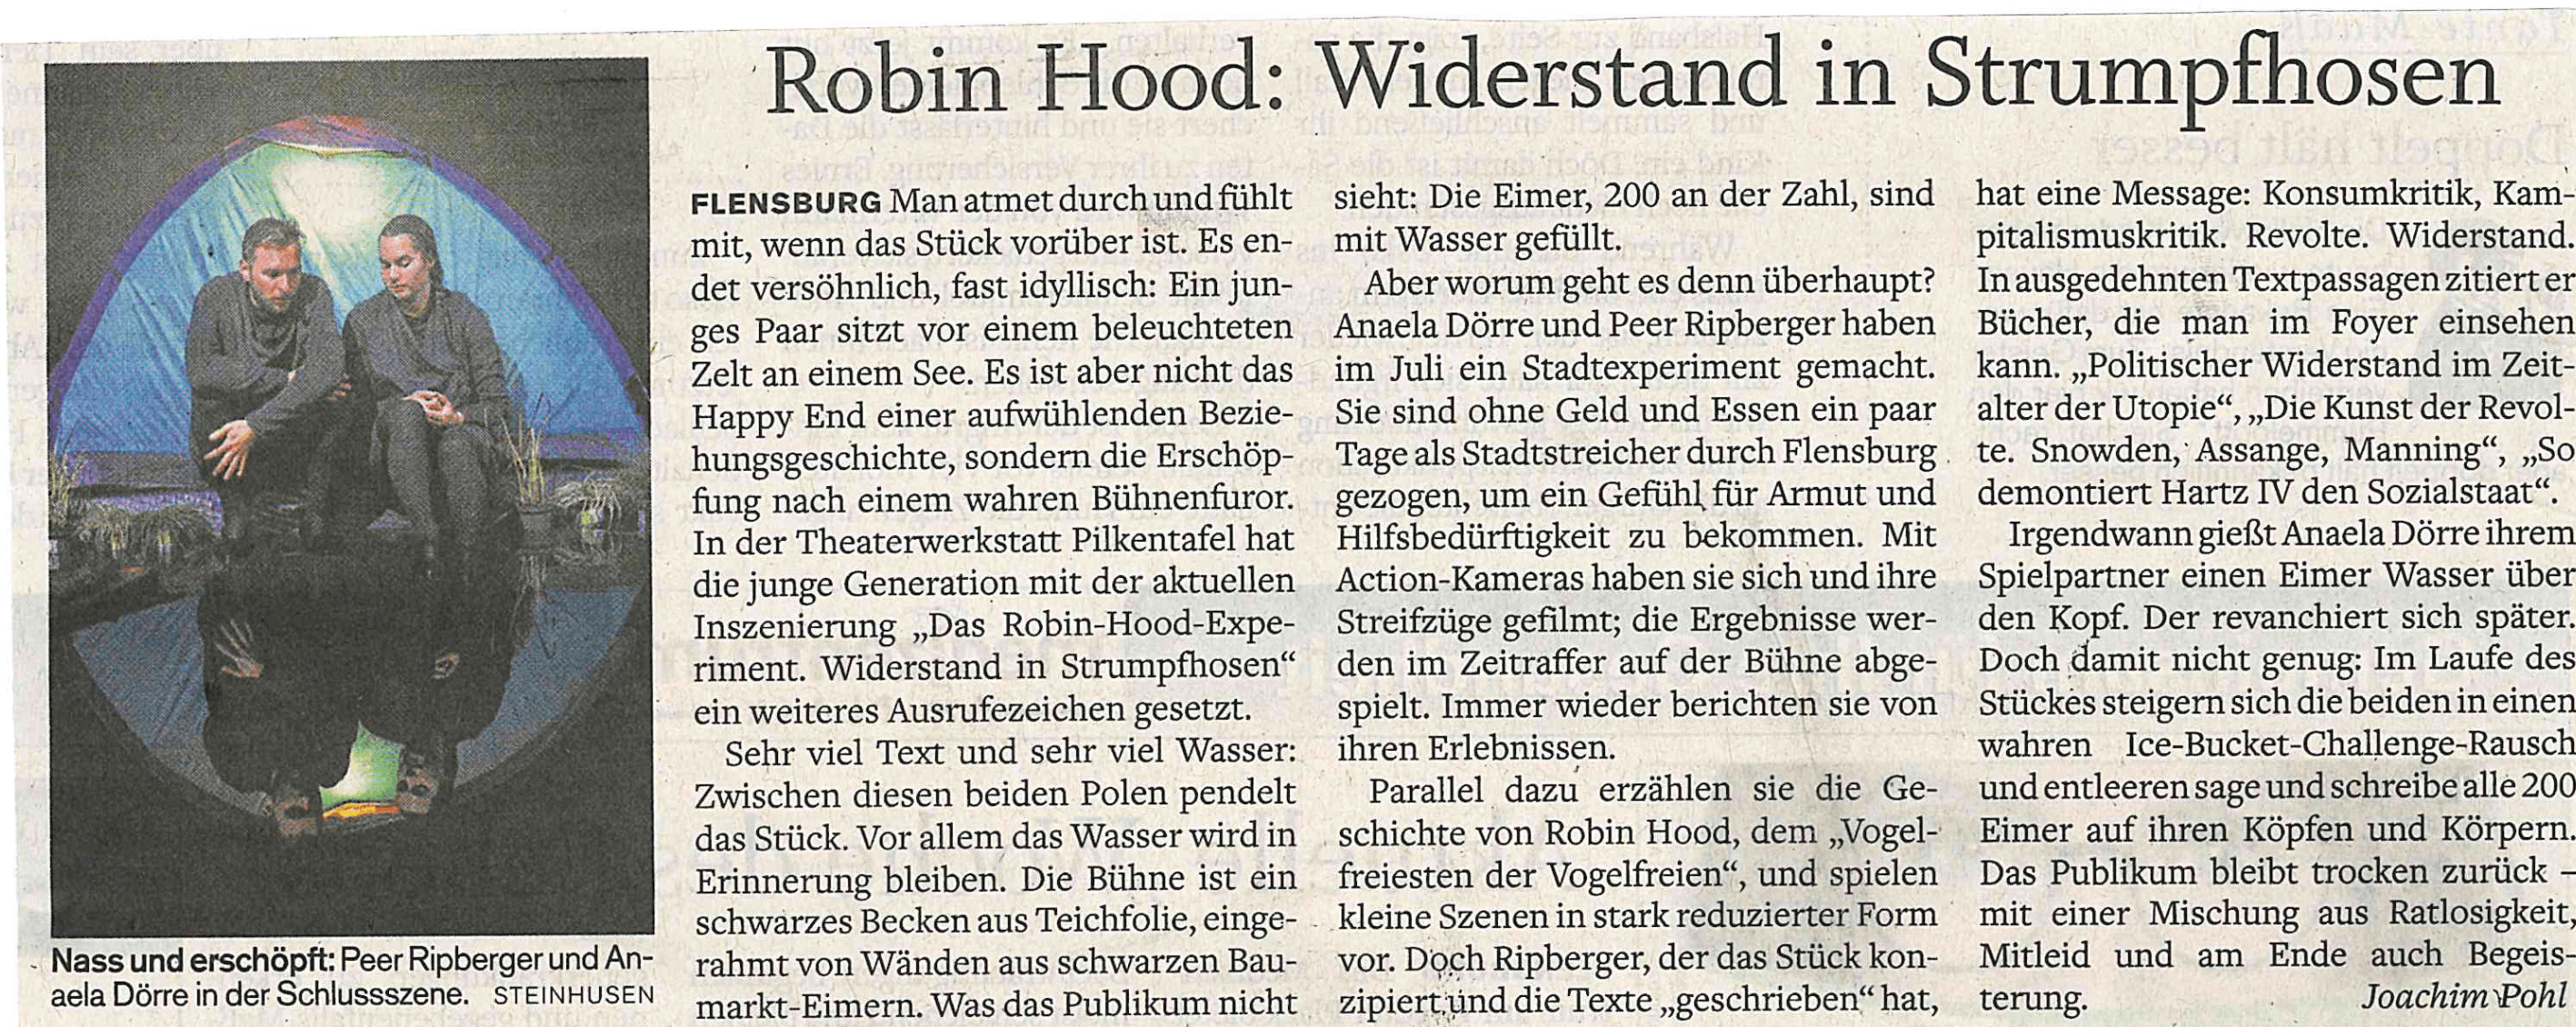 robin-hood-widerstand-in-strumpfhosen